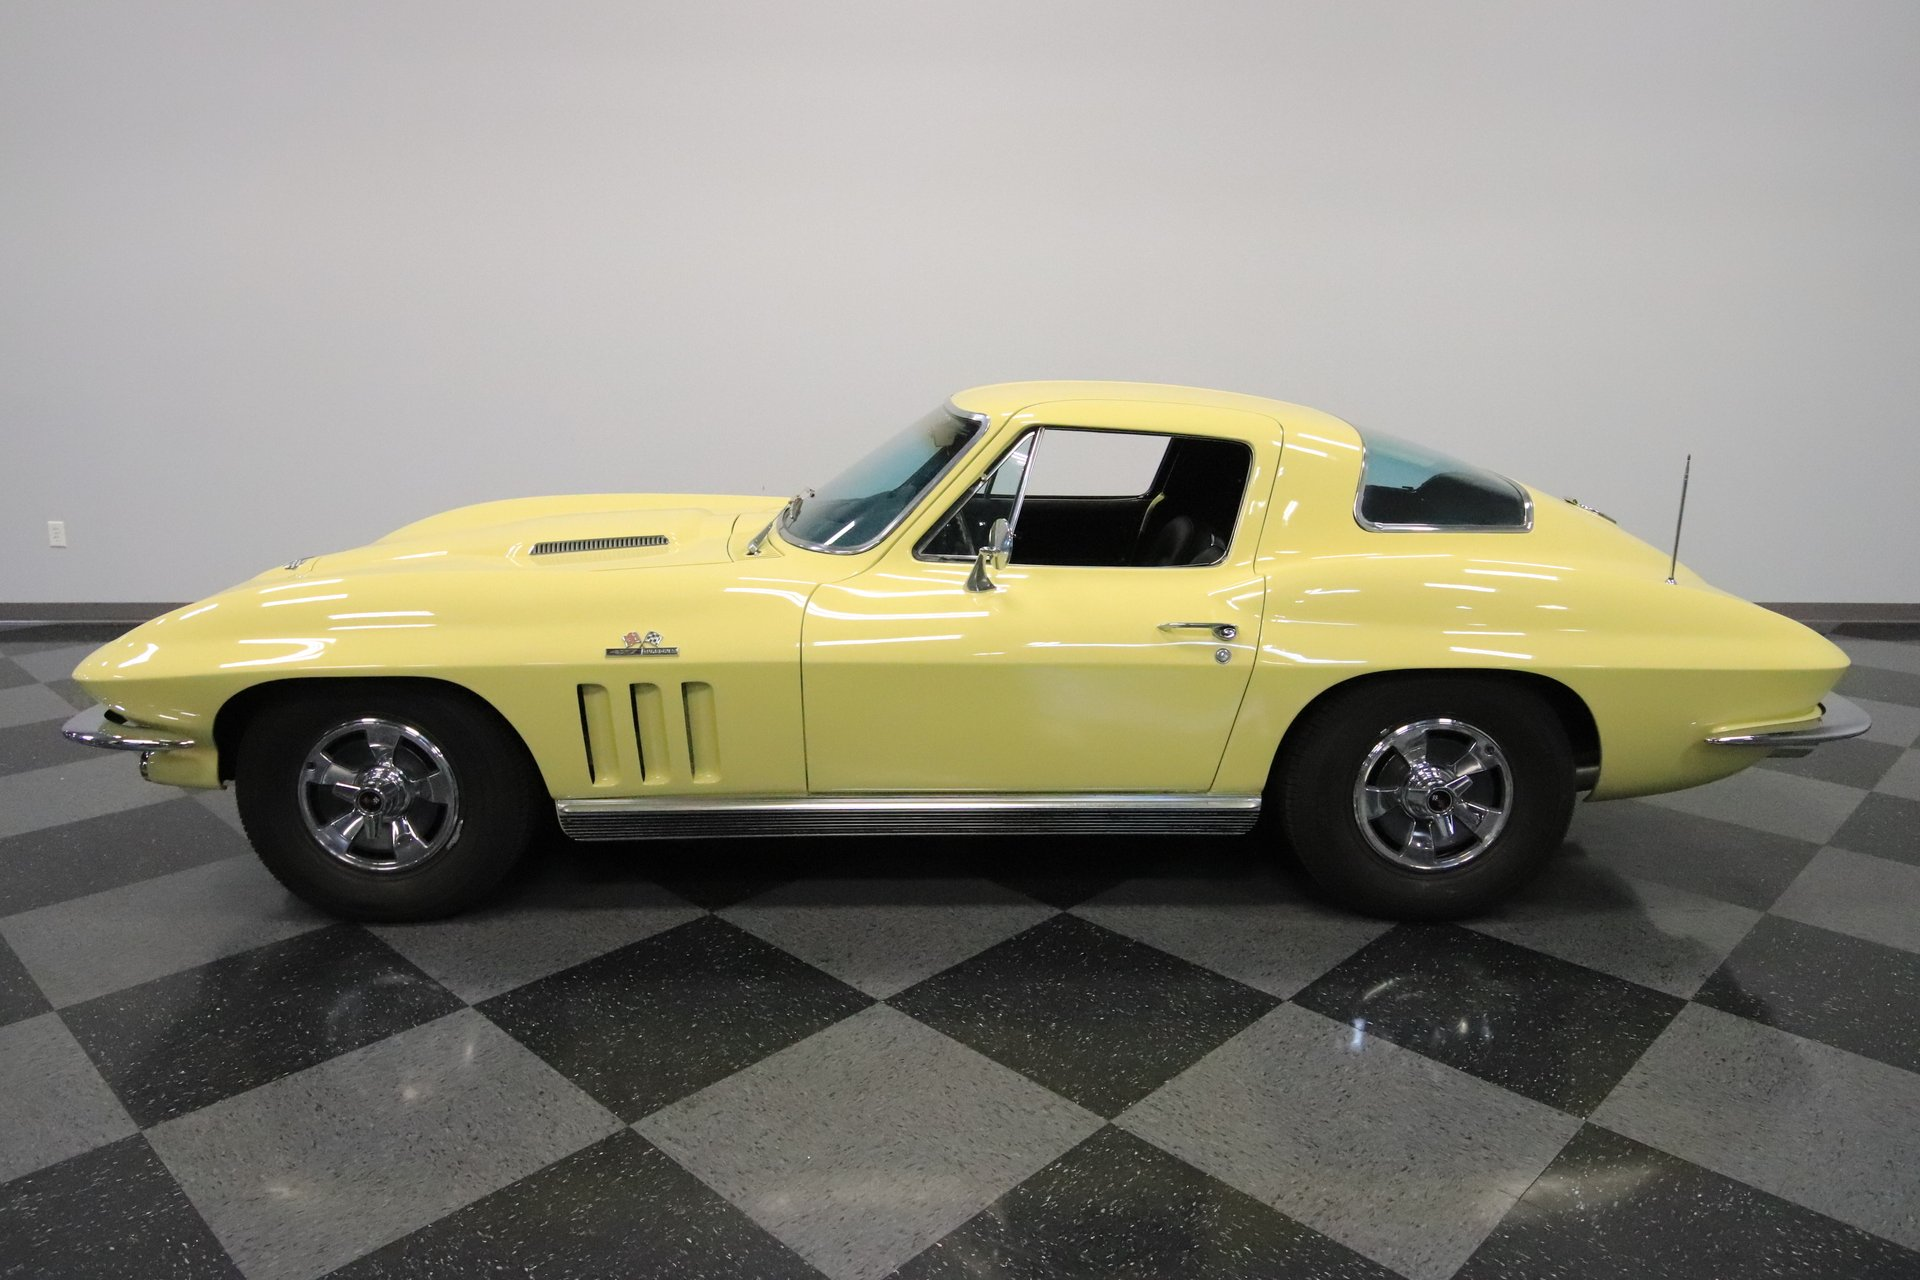 1966 Chevrolet Corvette Streetside Classics The Nation